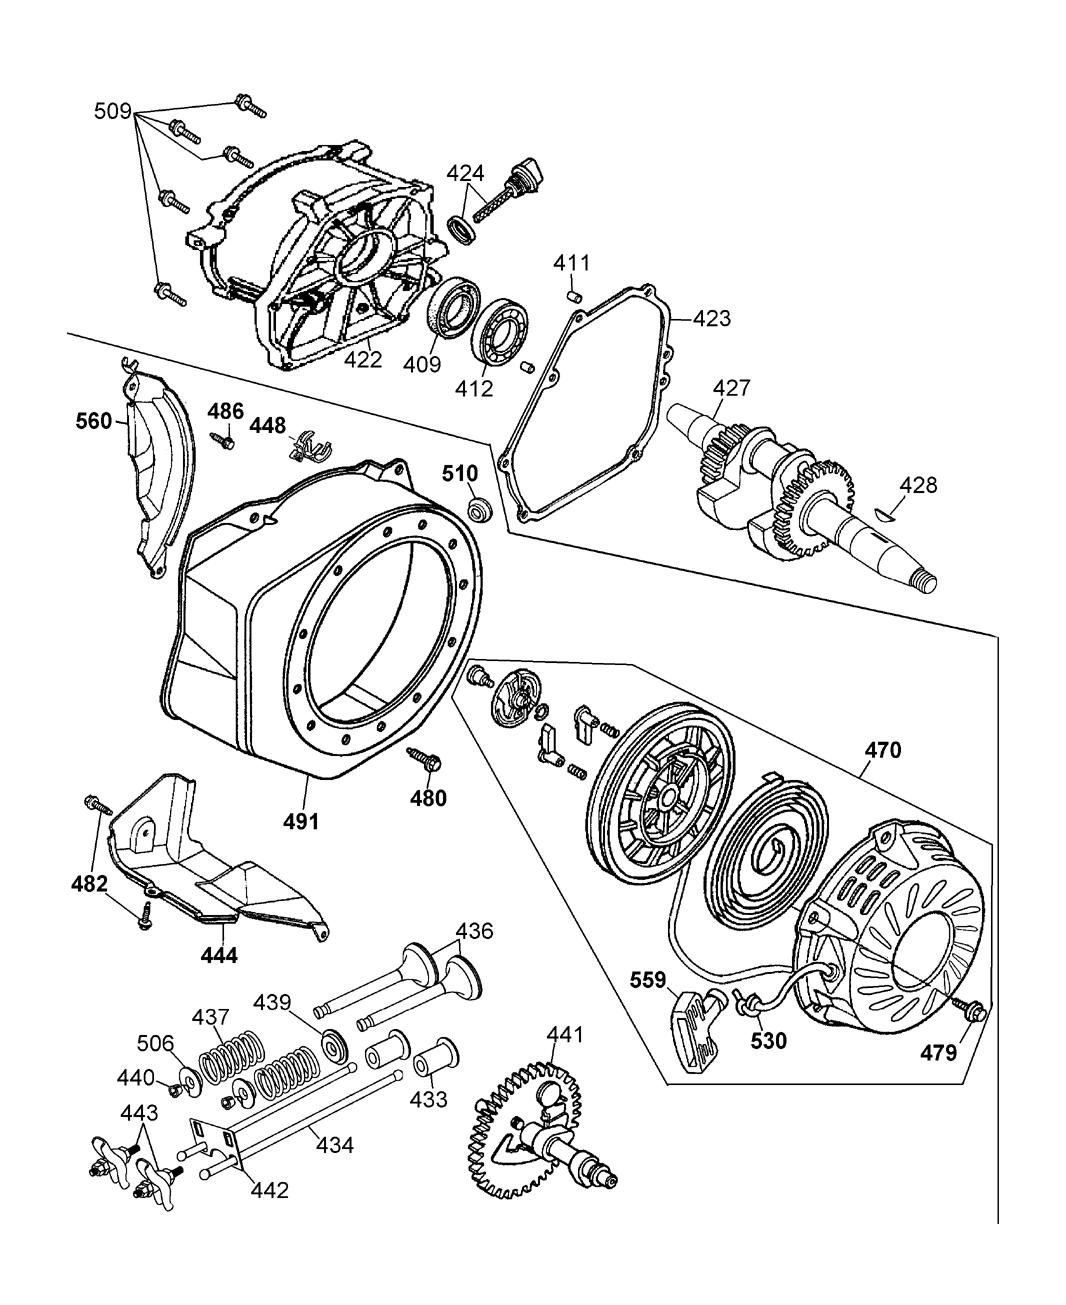 PCI2200-B3-Porter-Cable-T1-PB-1Break Down